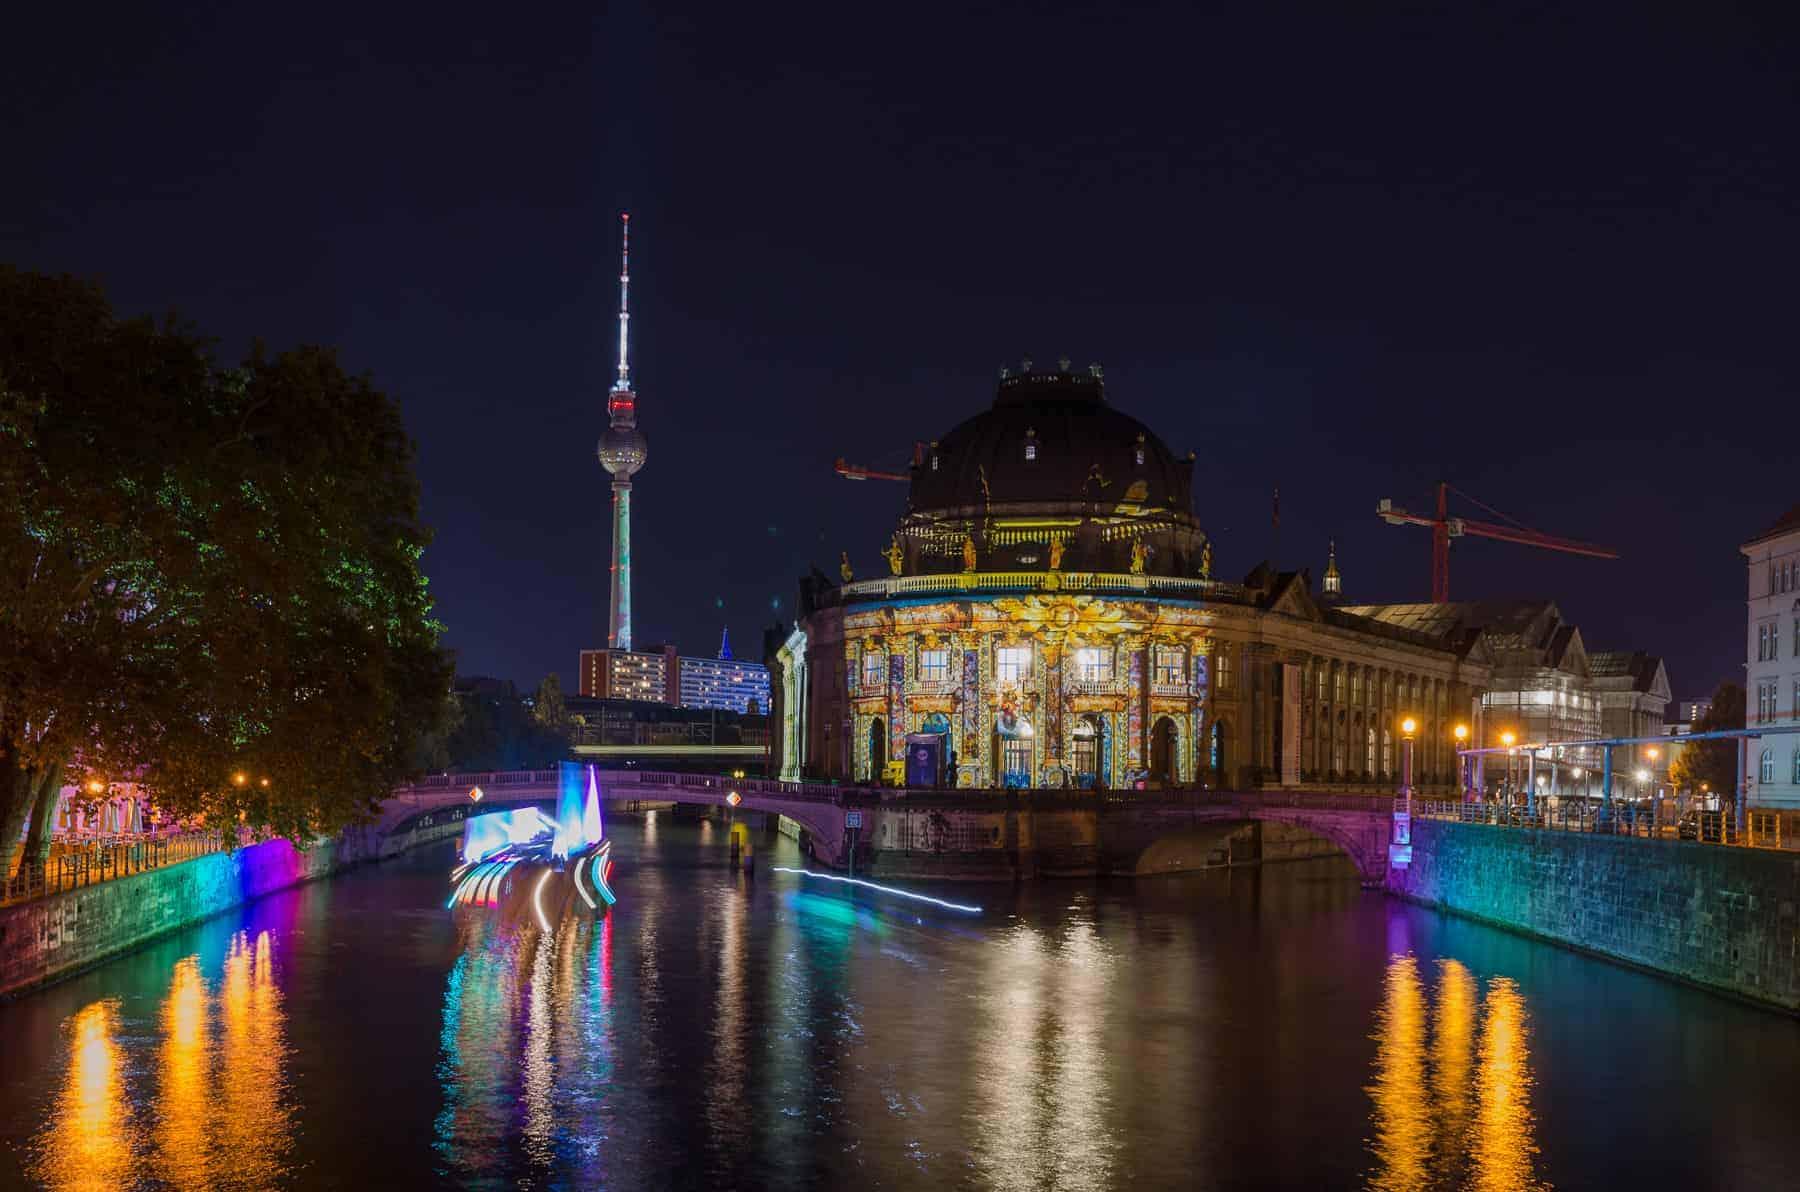 vegan-auf-reisen-berlin-synke-1